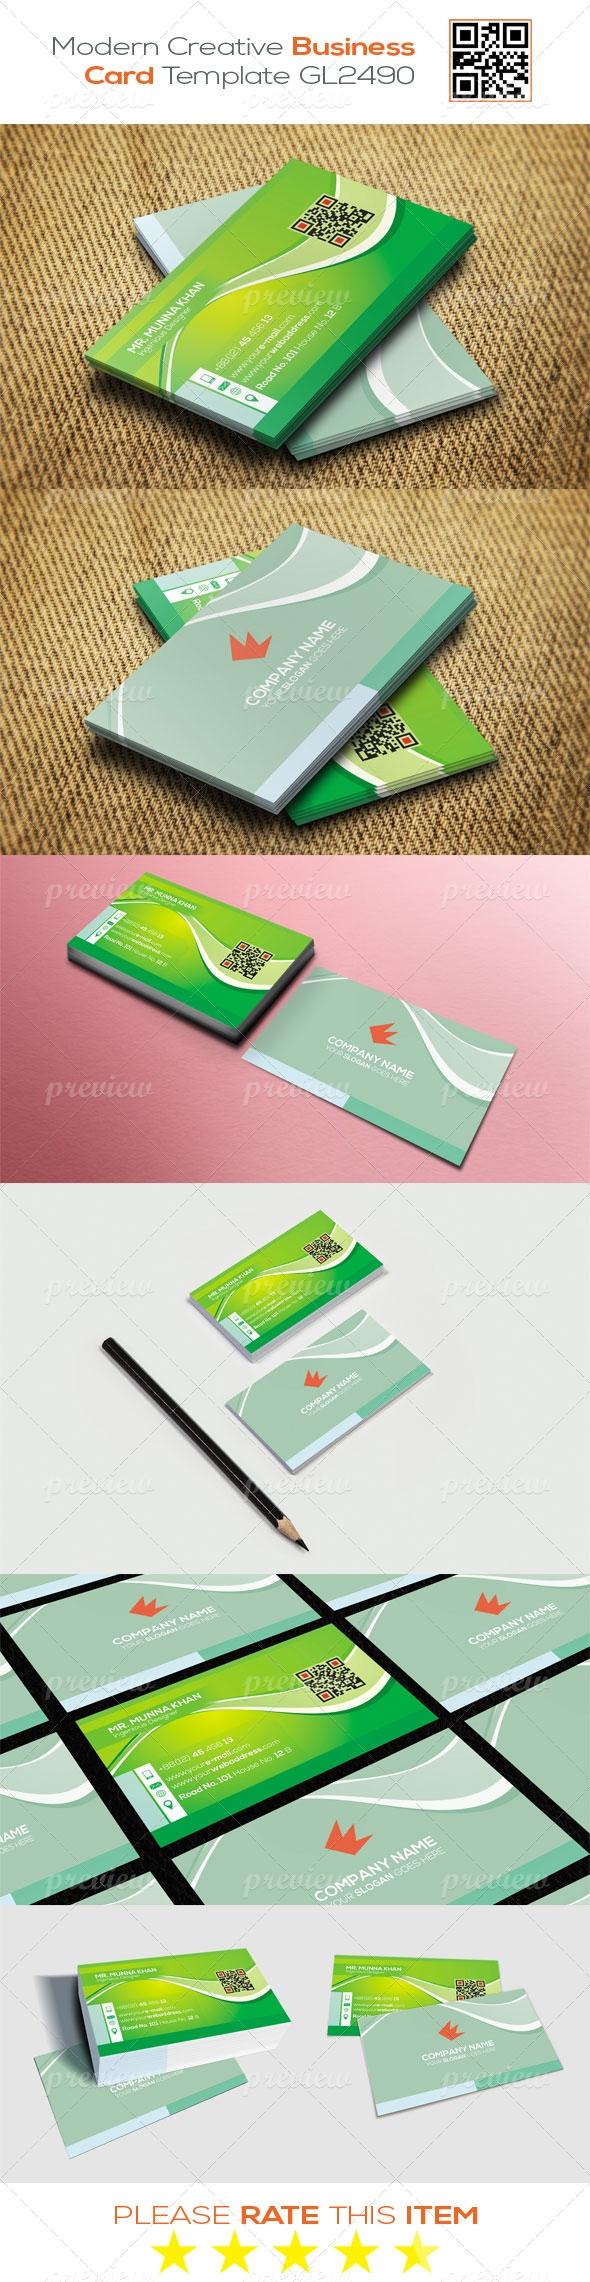 Modern Creative Business Card Template GL2490